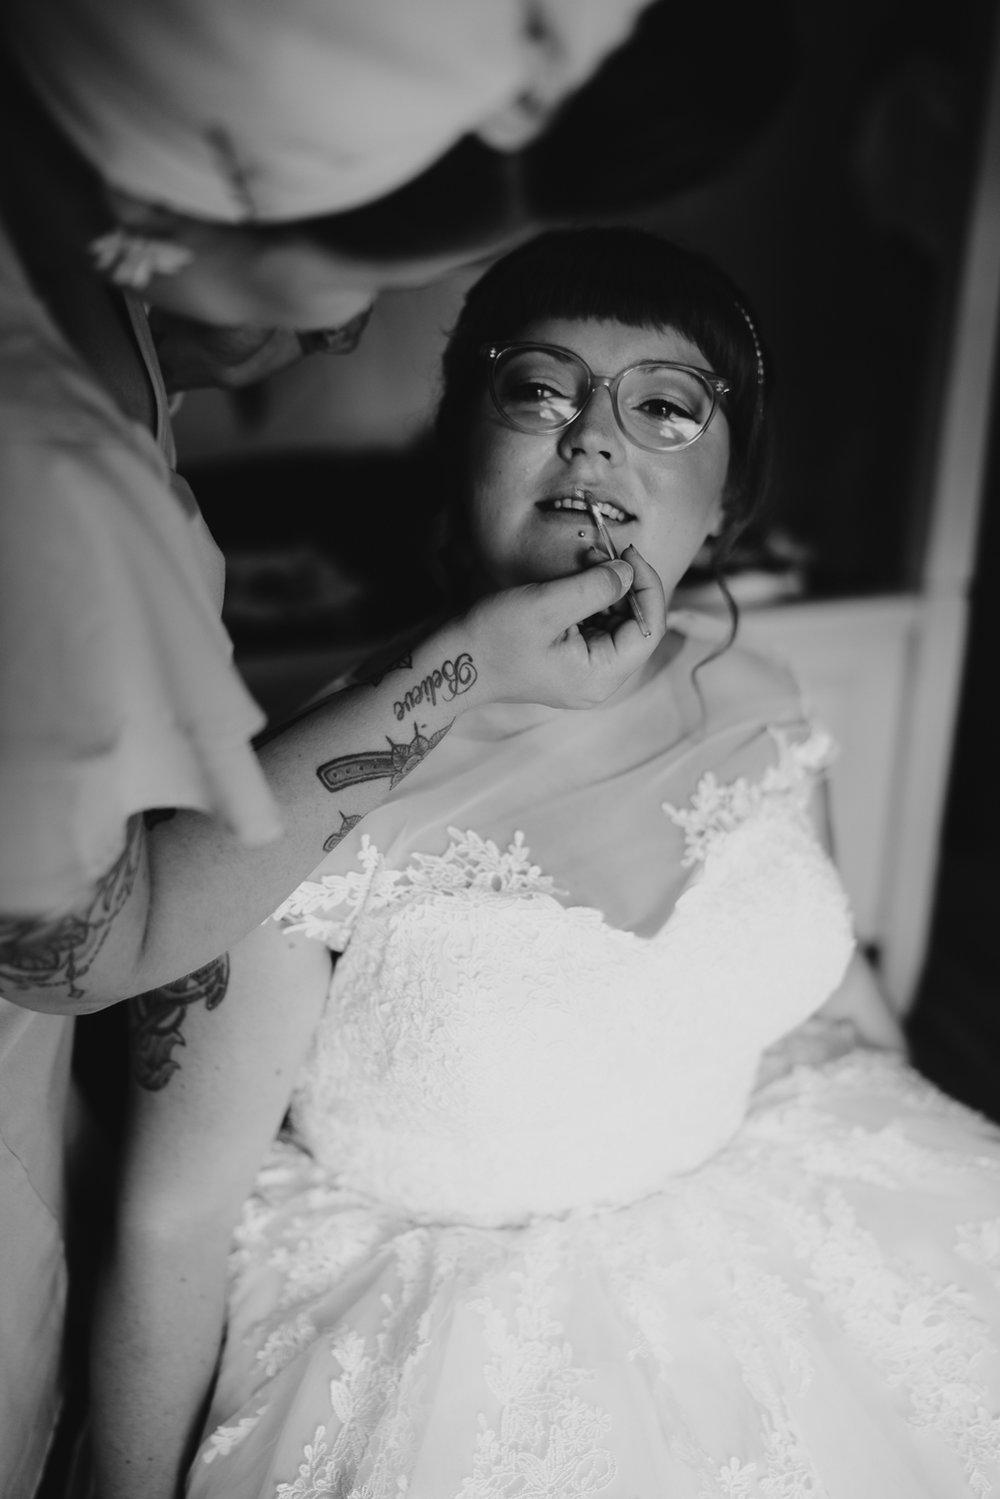 amsterdam-wedding-photographer-bruidsfotografie-trouwfotograaf-mark-hadden-_DSC6578-2.jpg